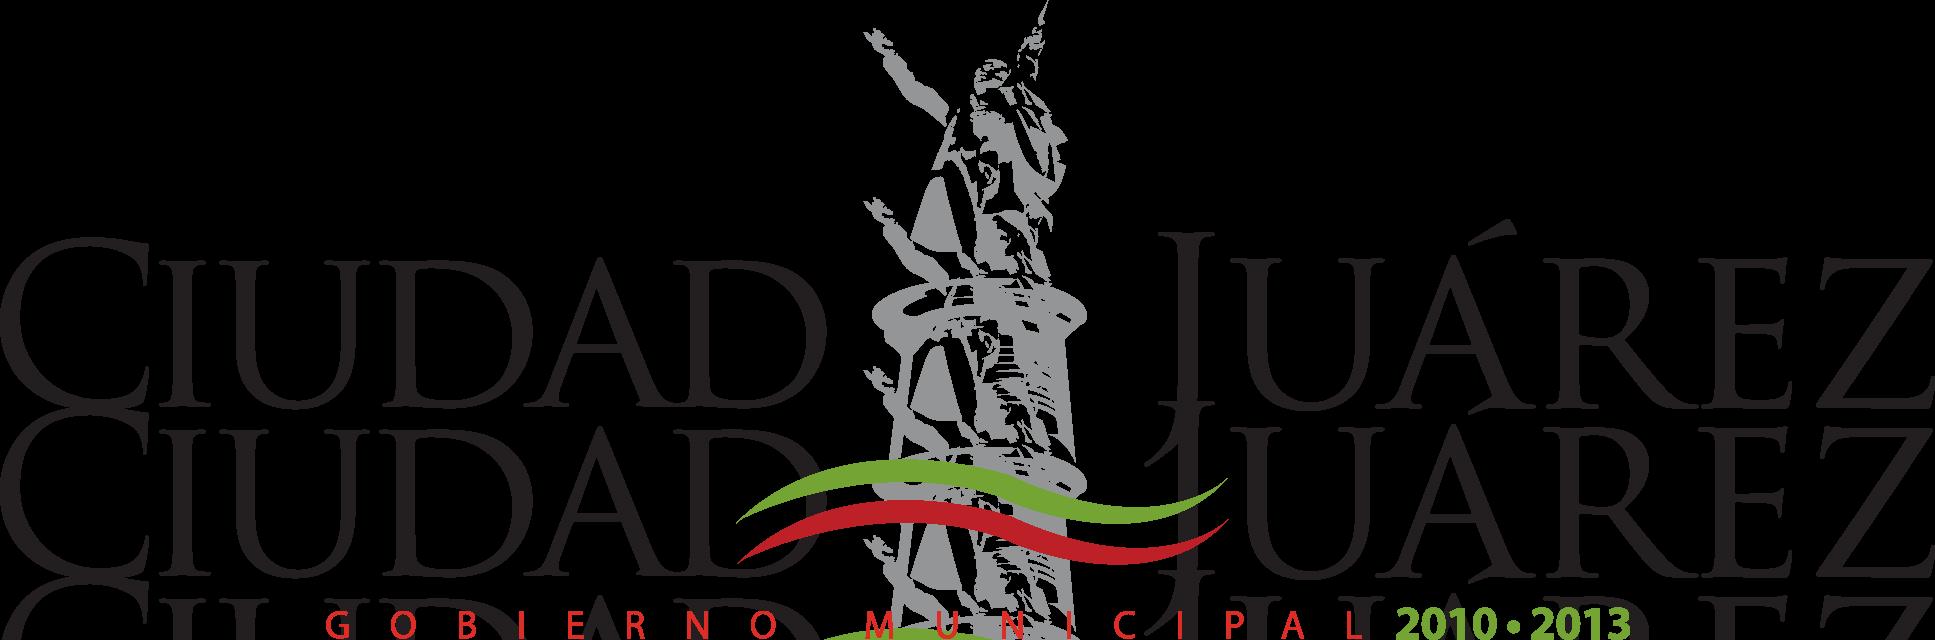 Ciudad Juarez Municipio.png